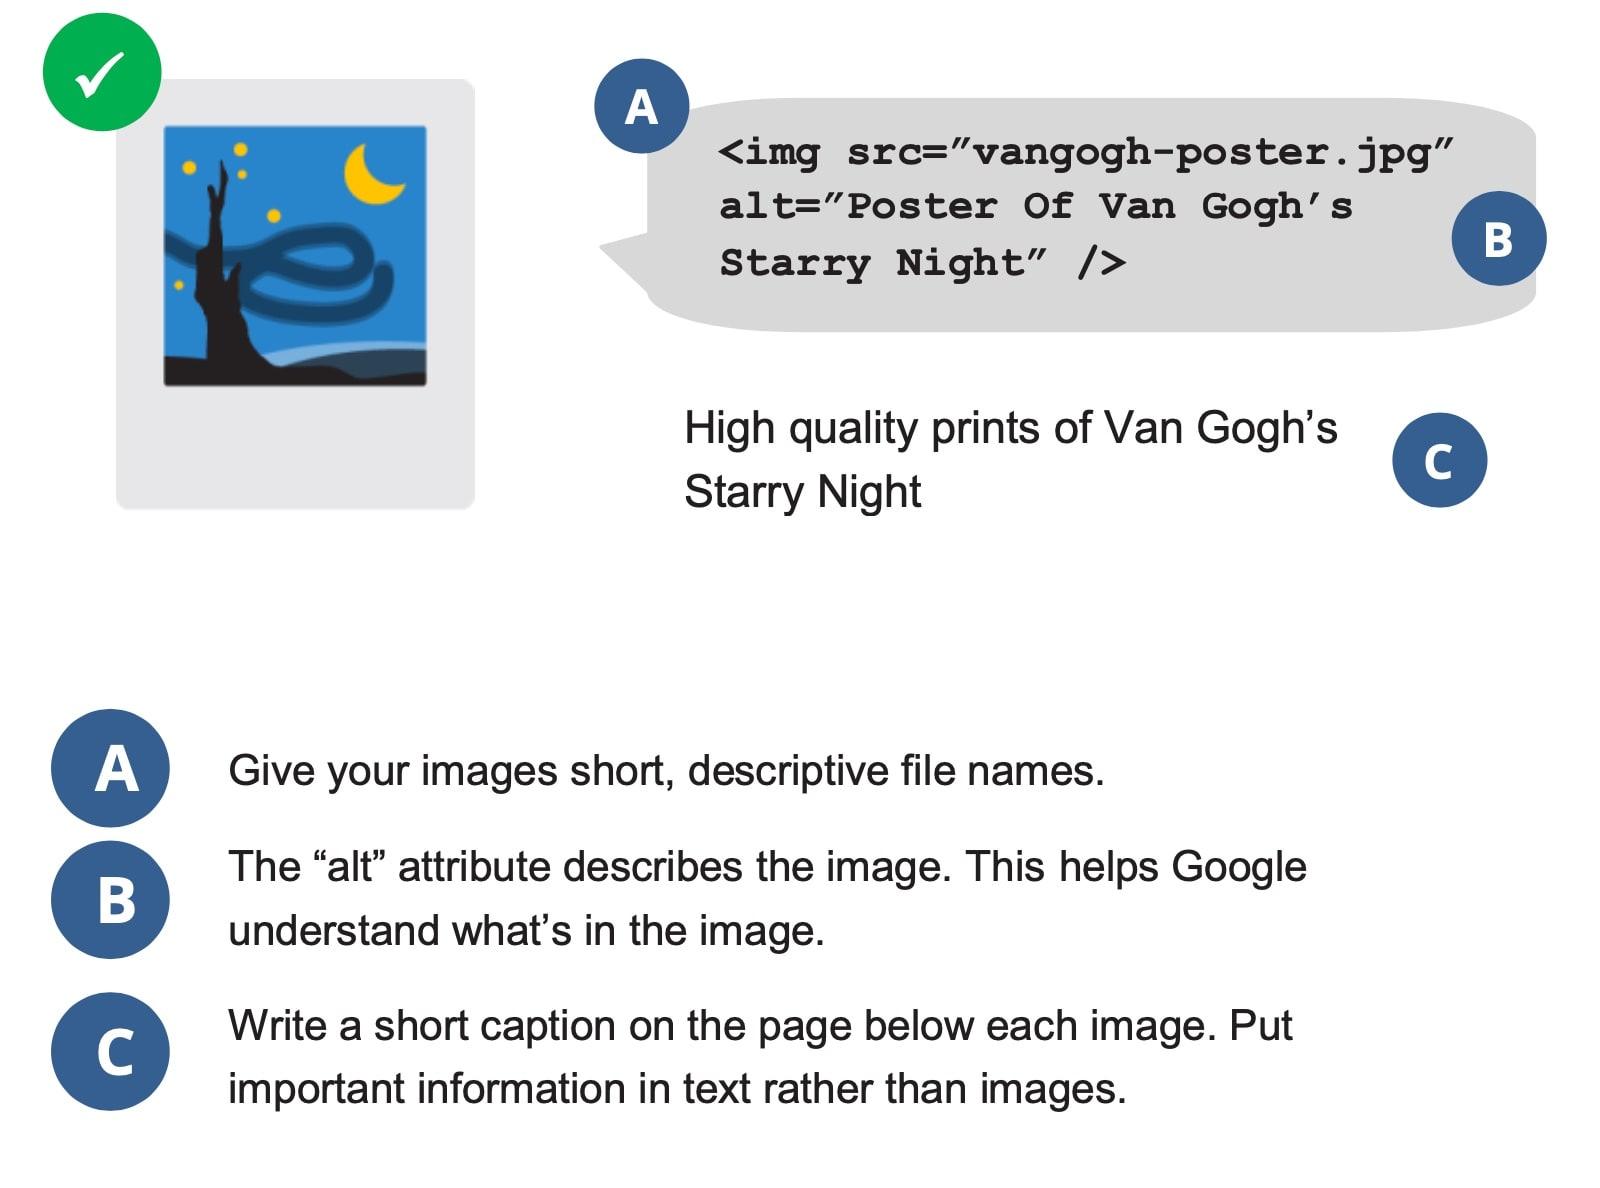 Image SEO Best Practices